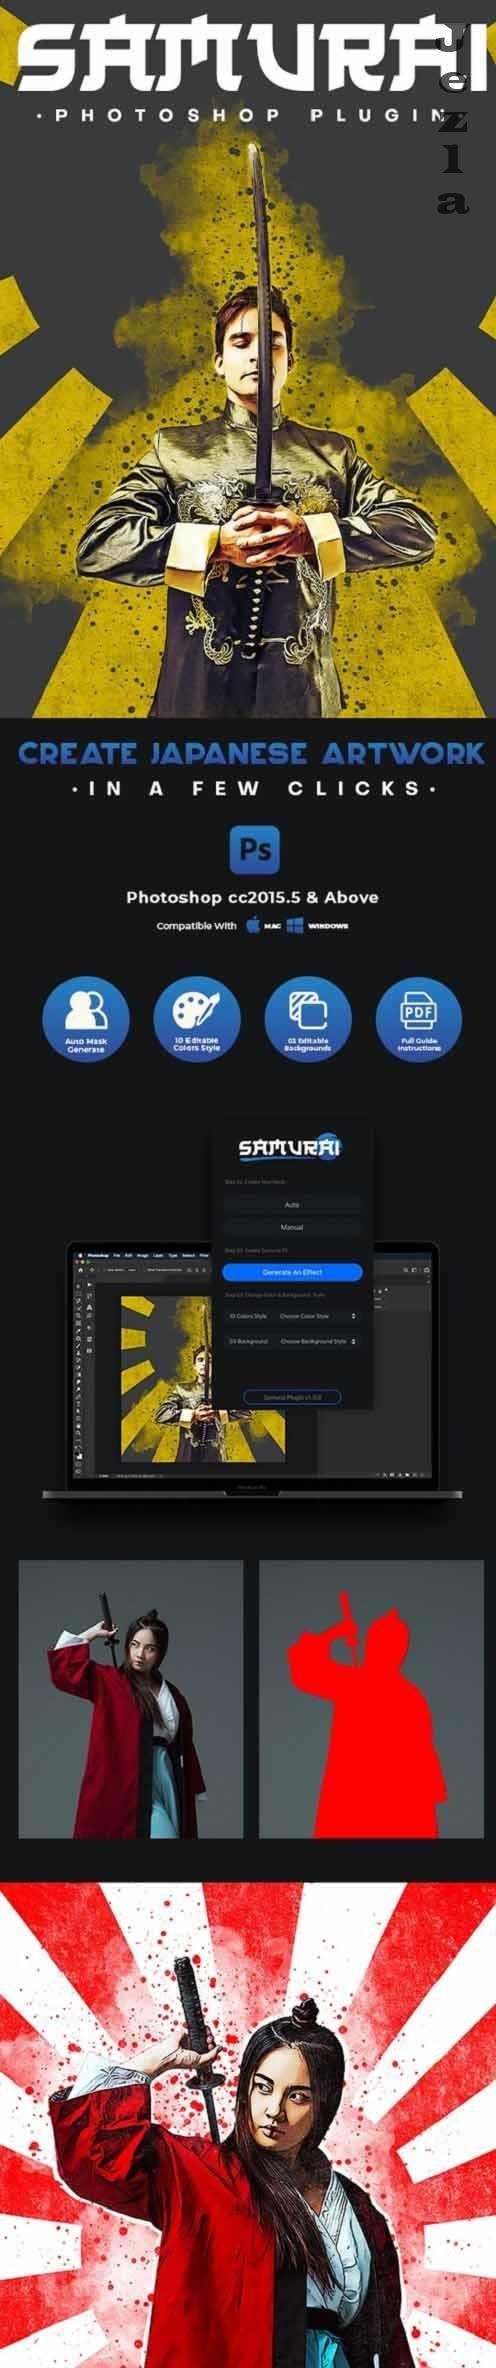 GraphicRiver - Samurai - Photoshop Plugin 29624755